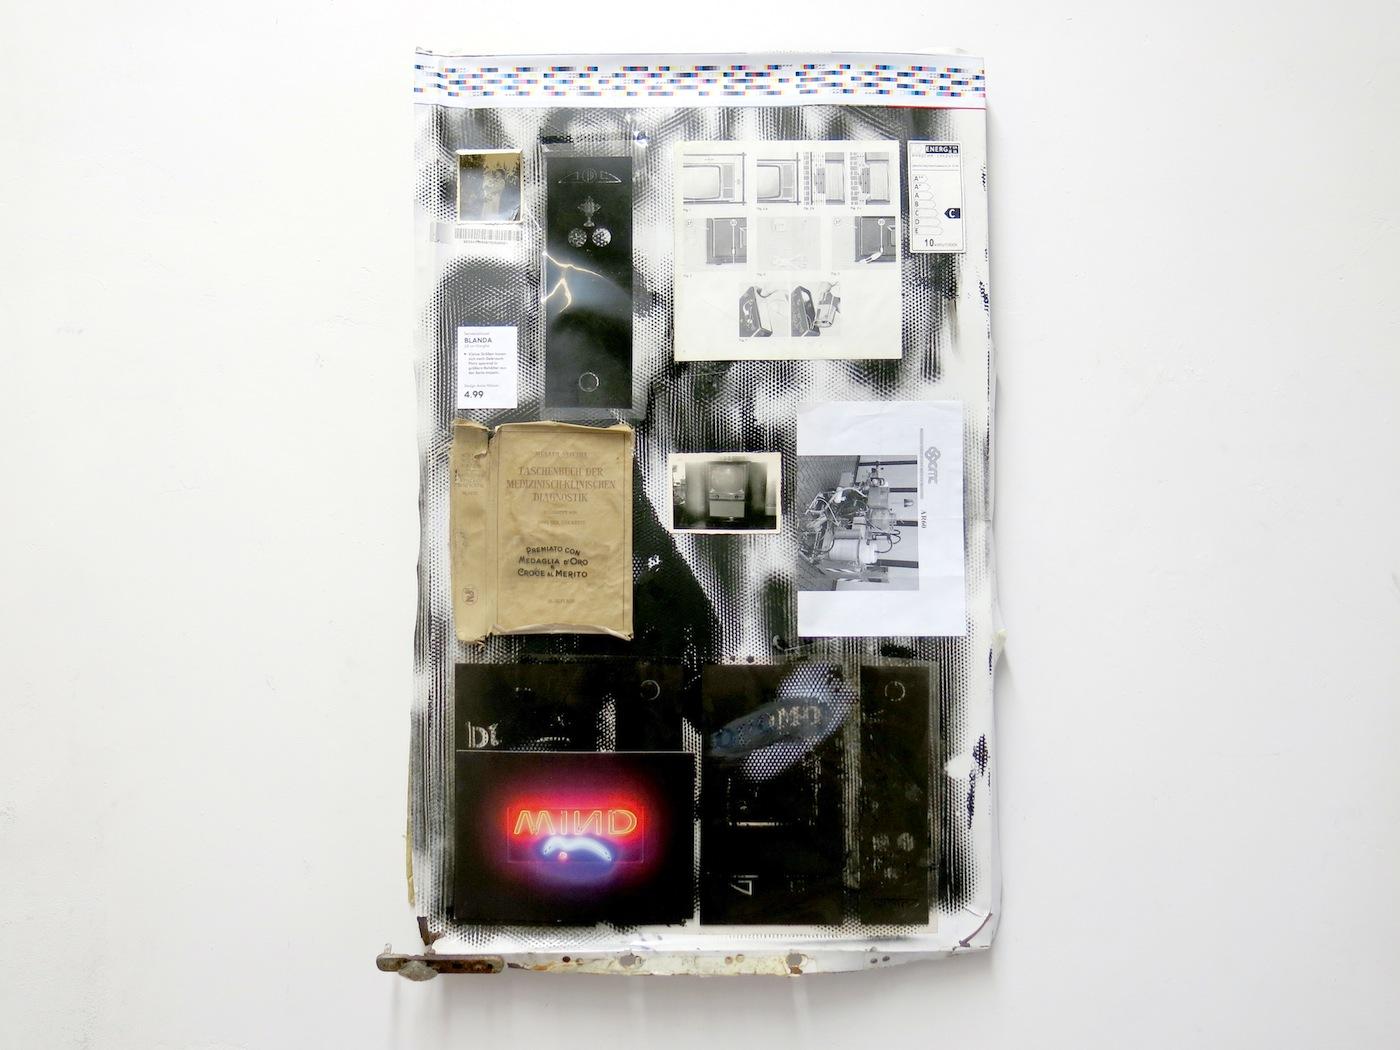 Lapo Simeoni, Blanda Mind and Diagnostik theorie, 2016, mix media su pannello frigorifero dell'artista, 80x56x8 cm